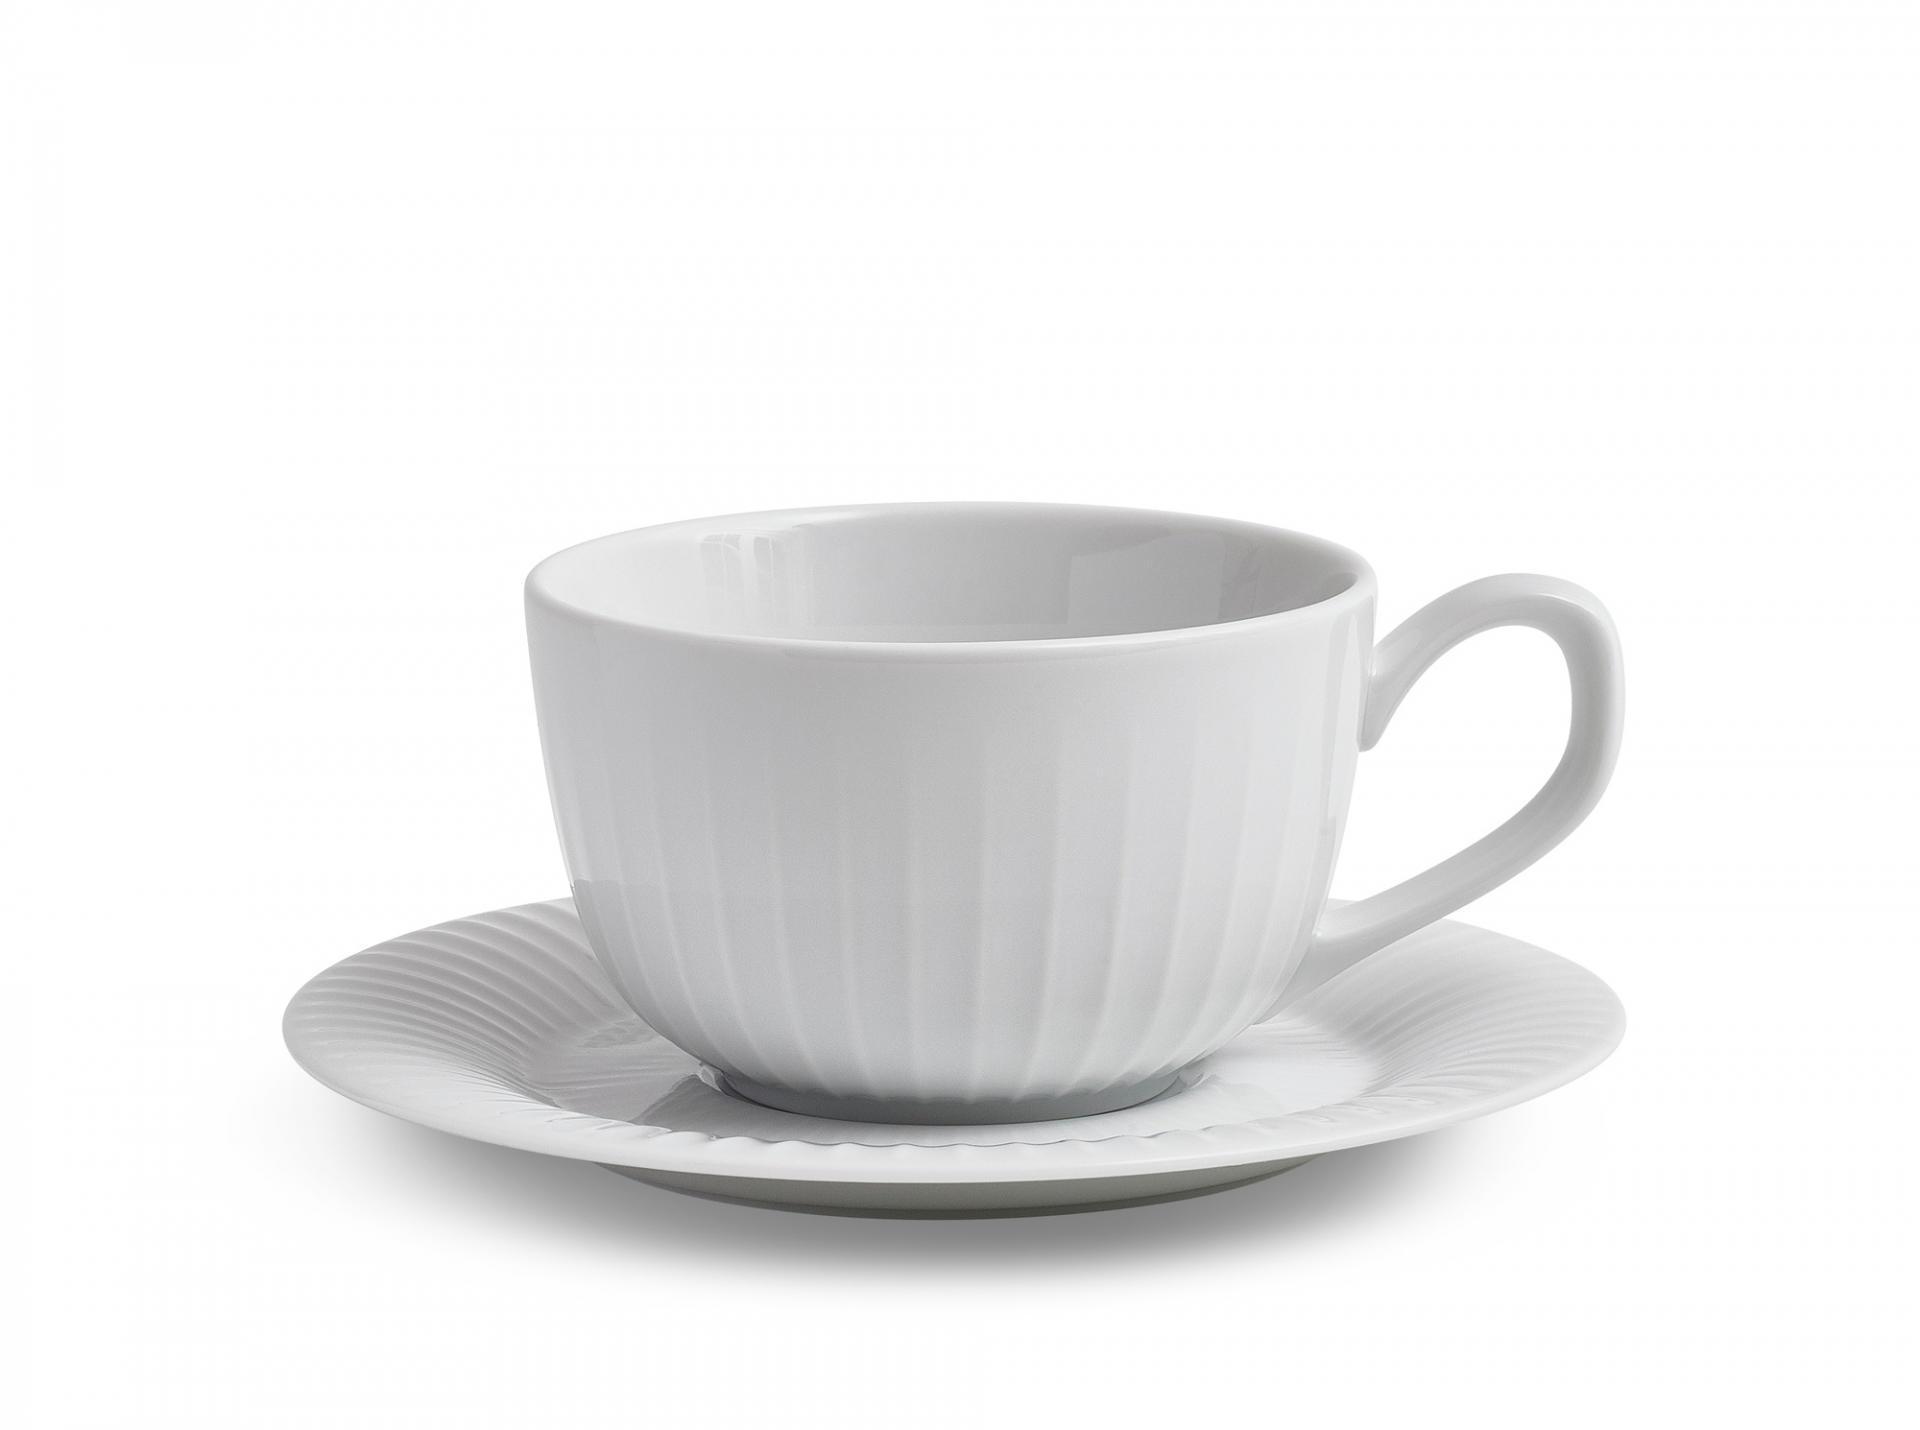 KÄHLER Šálek s podšálkem Hammershøi White, bílá barva, keramika